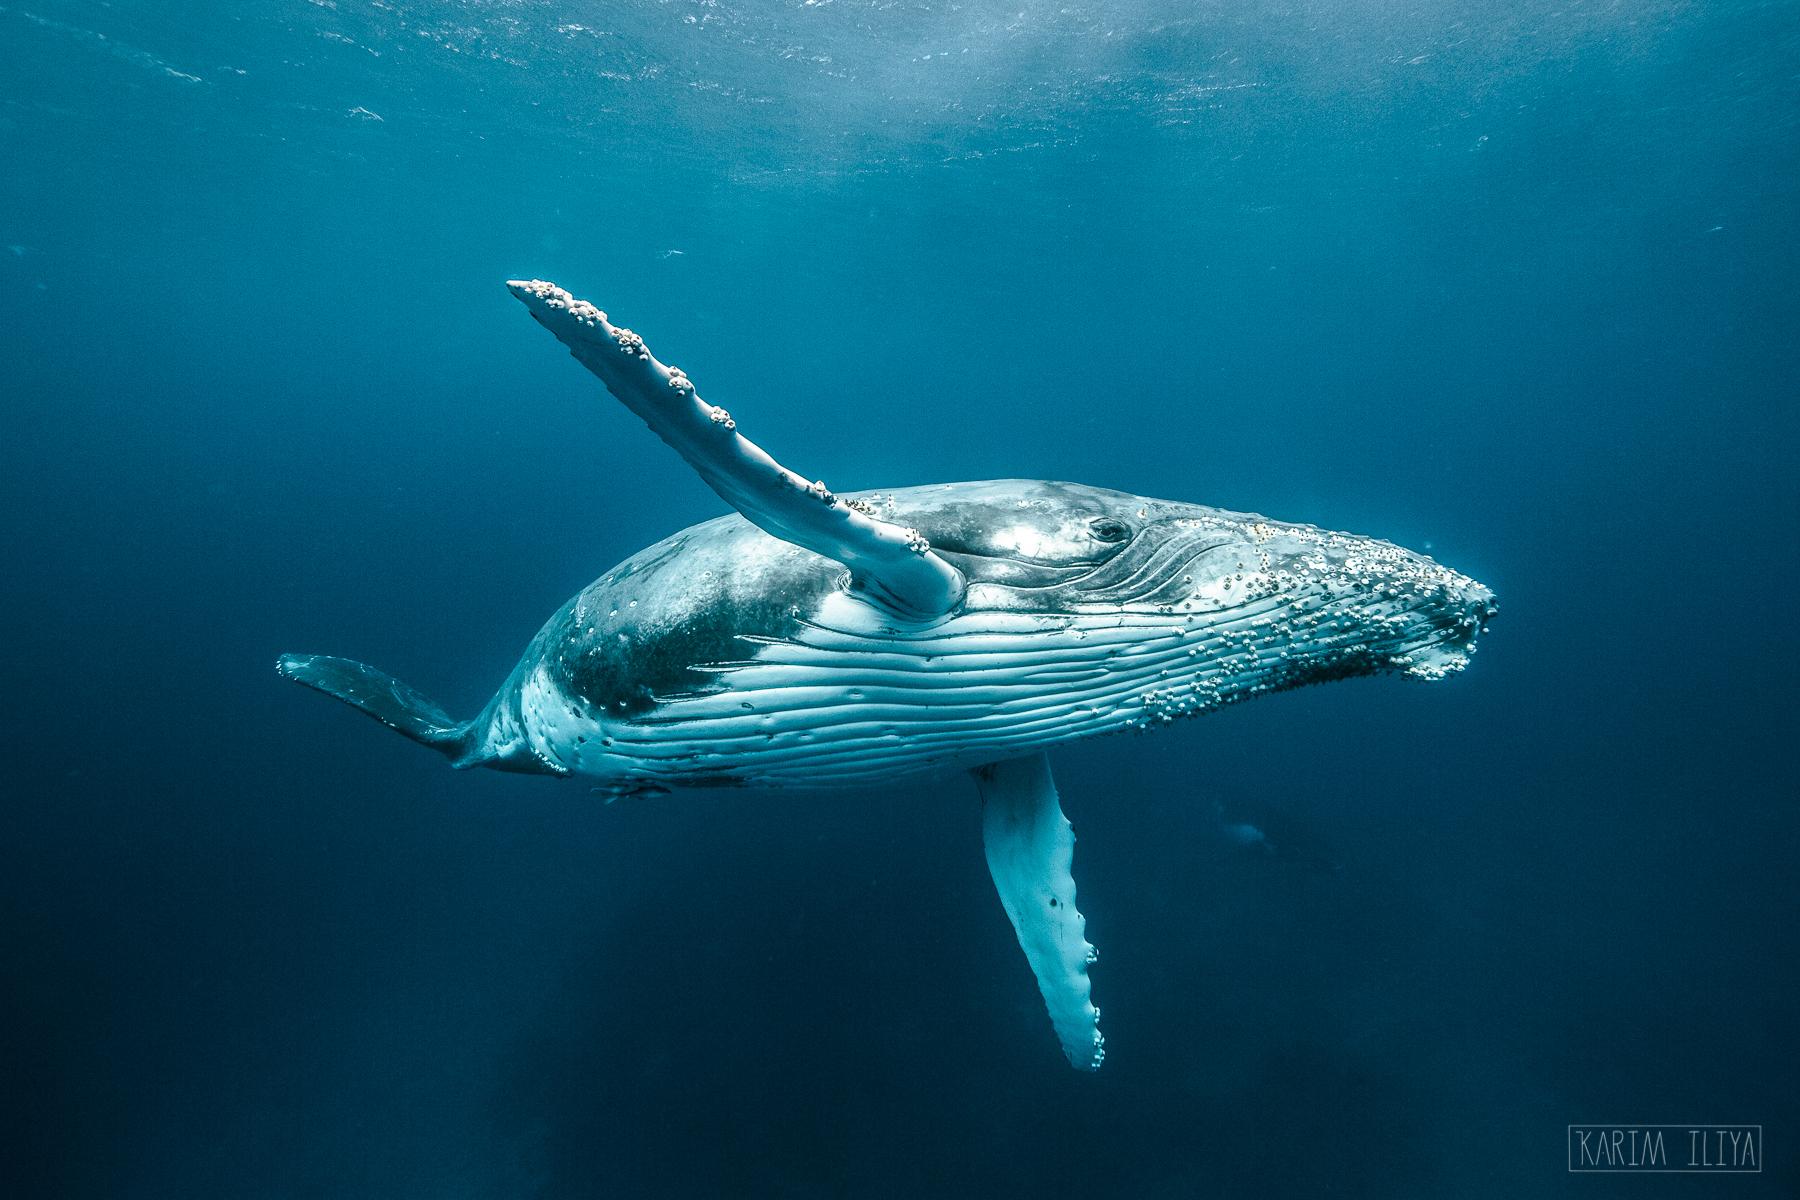 flying-underwater-baleen-humpback-snorkel.jpg